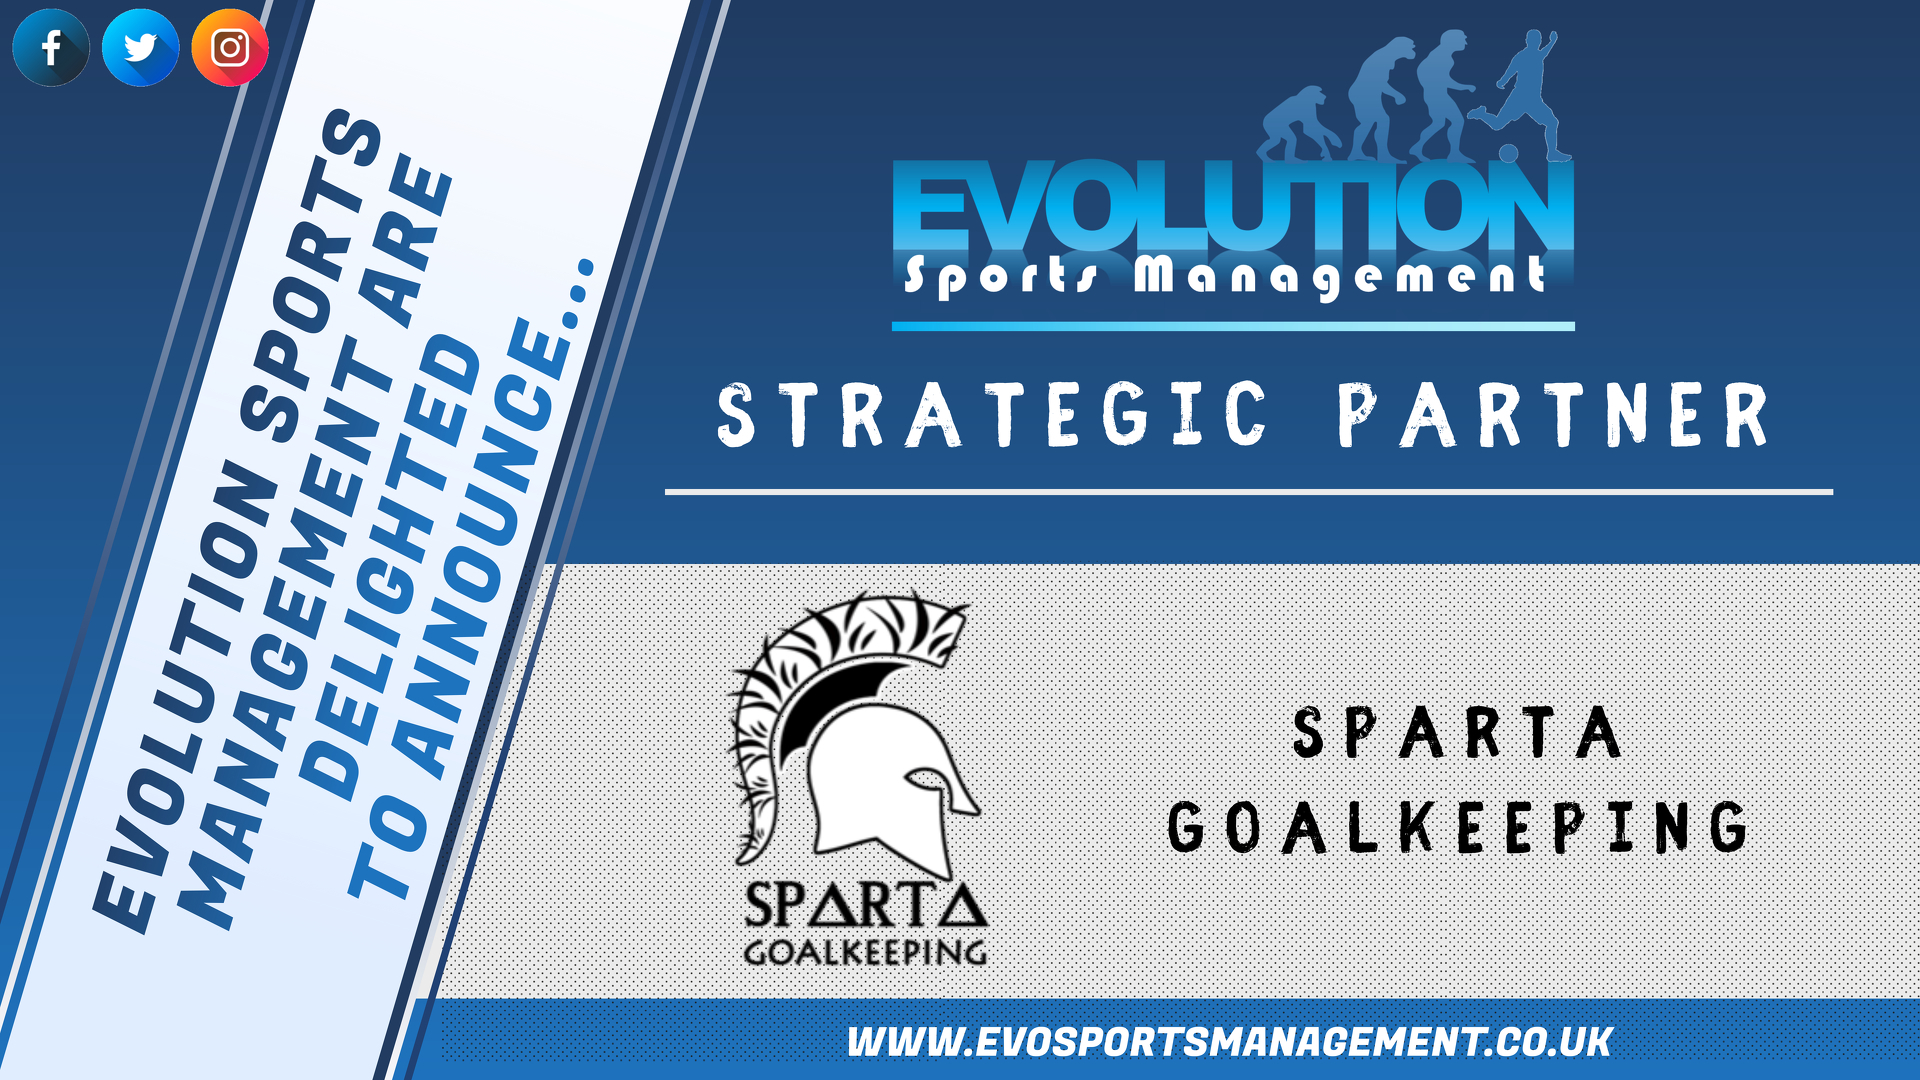 Sparta GK Partnership Announcement